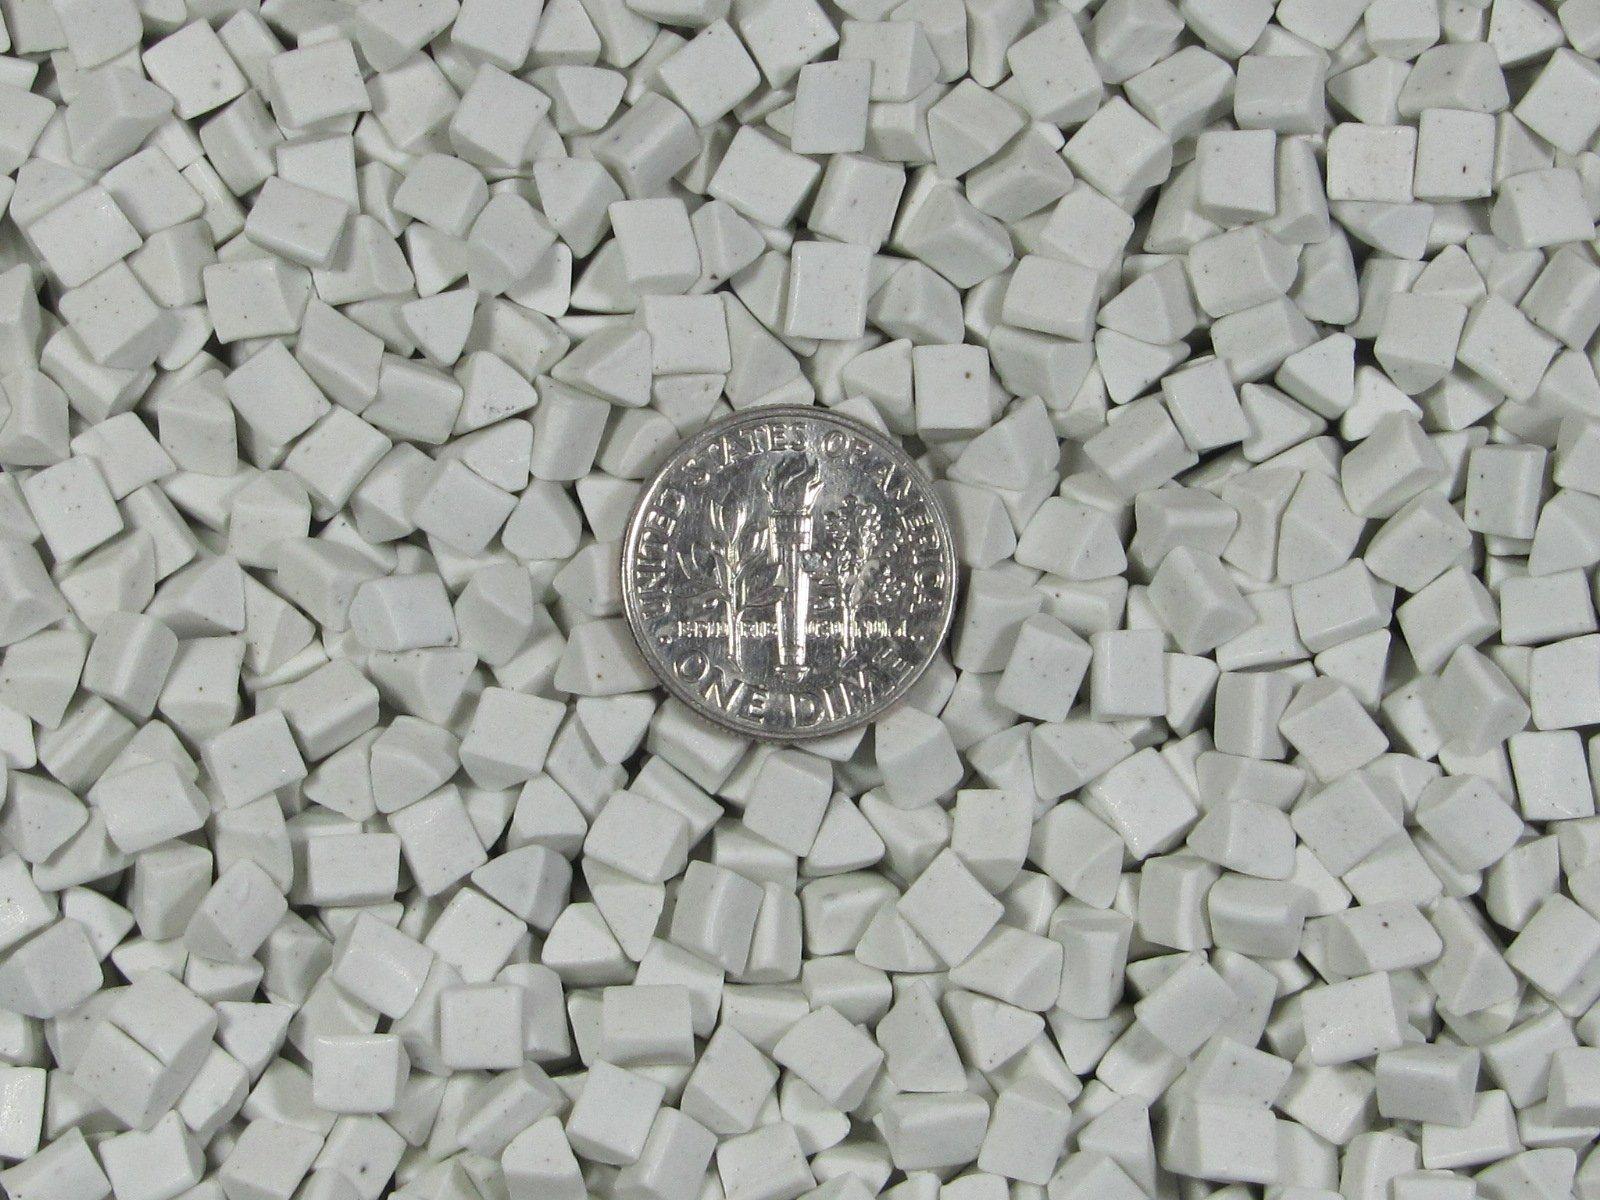 Ceramic Porcelain Tumbling Media 8 Lbs. 4 mm X 4 mm Polishing Triangles (White)